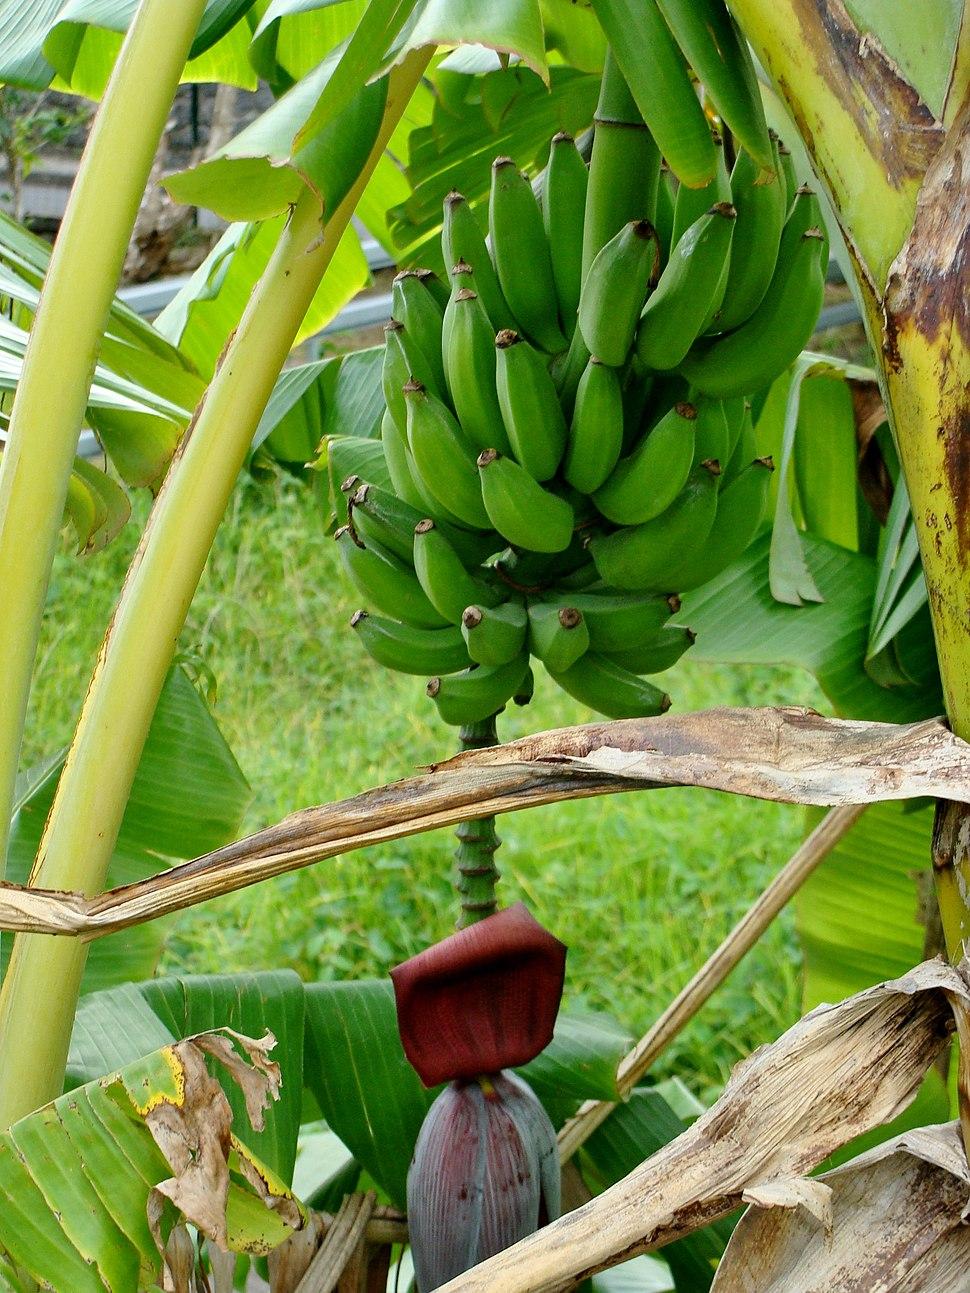 Banana three in Réunion